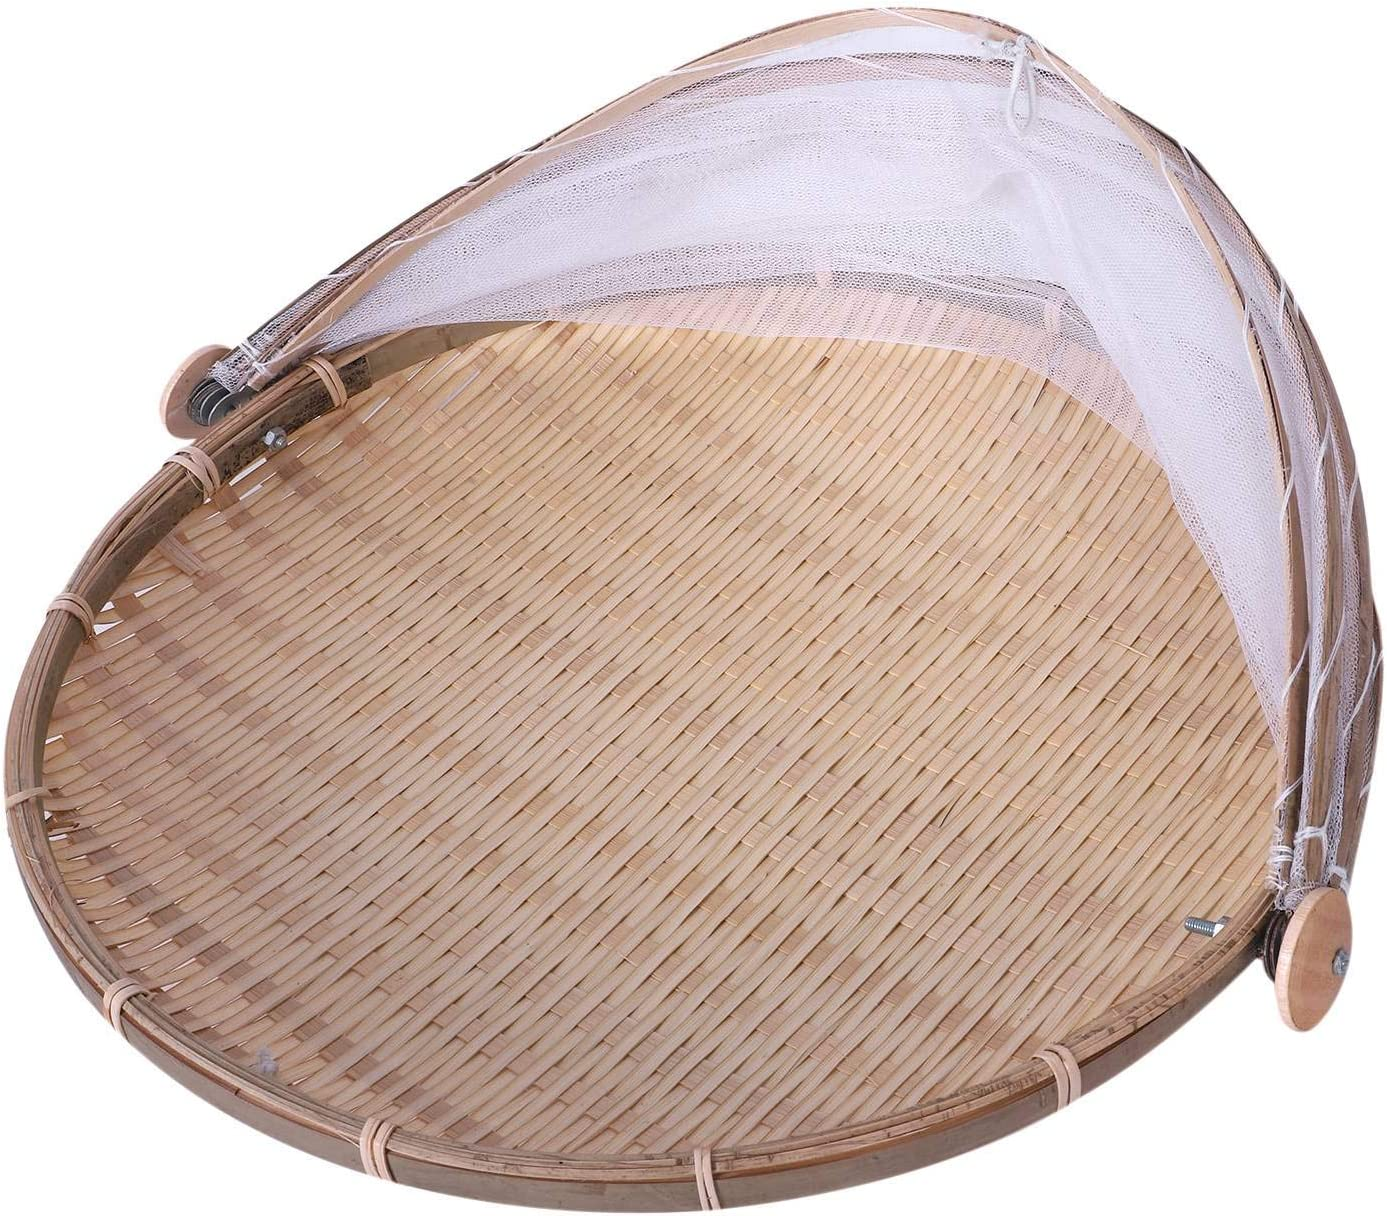 ACAMPTAR Handmade Bamboo Woven Bug Proof Wicker Basket Antipasto Picnic Vassoio di Frutta Cibo Pane Piatti Copertura con Garza Panier Osier